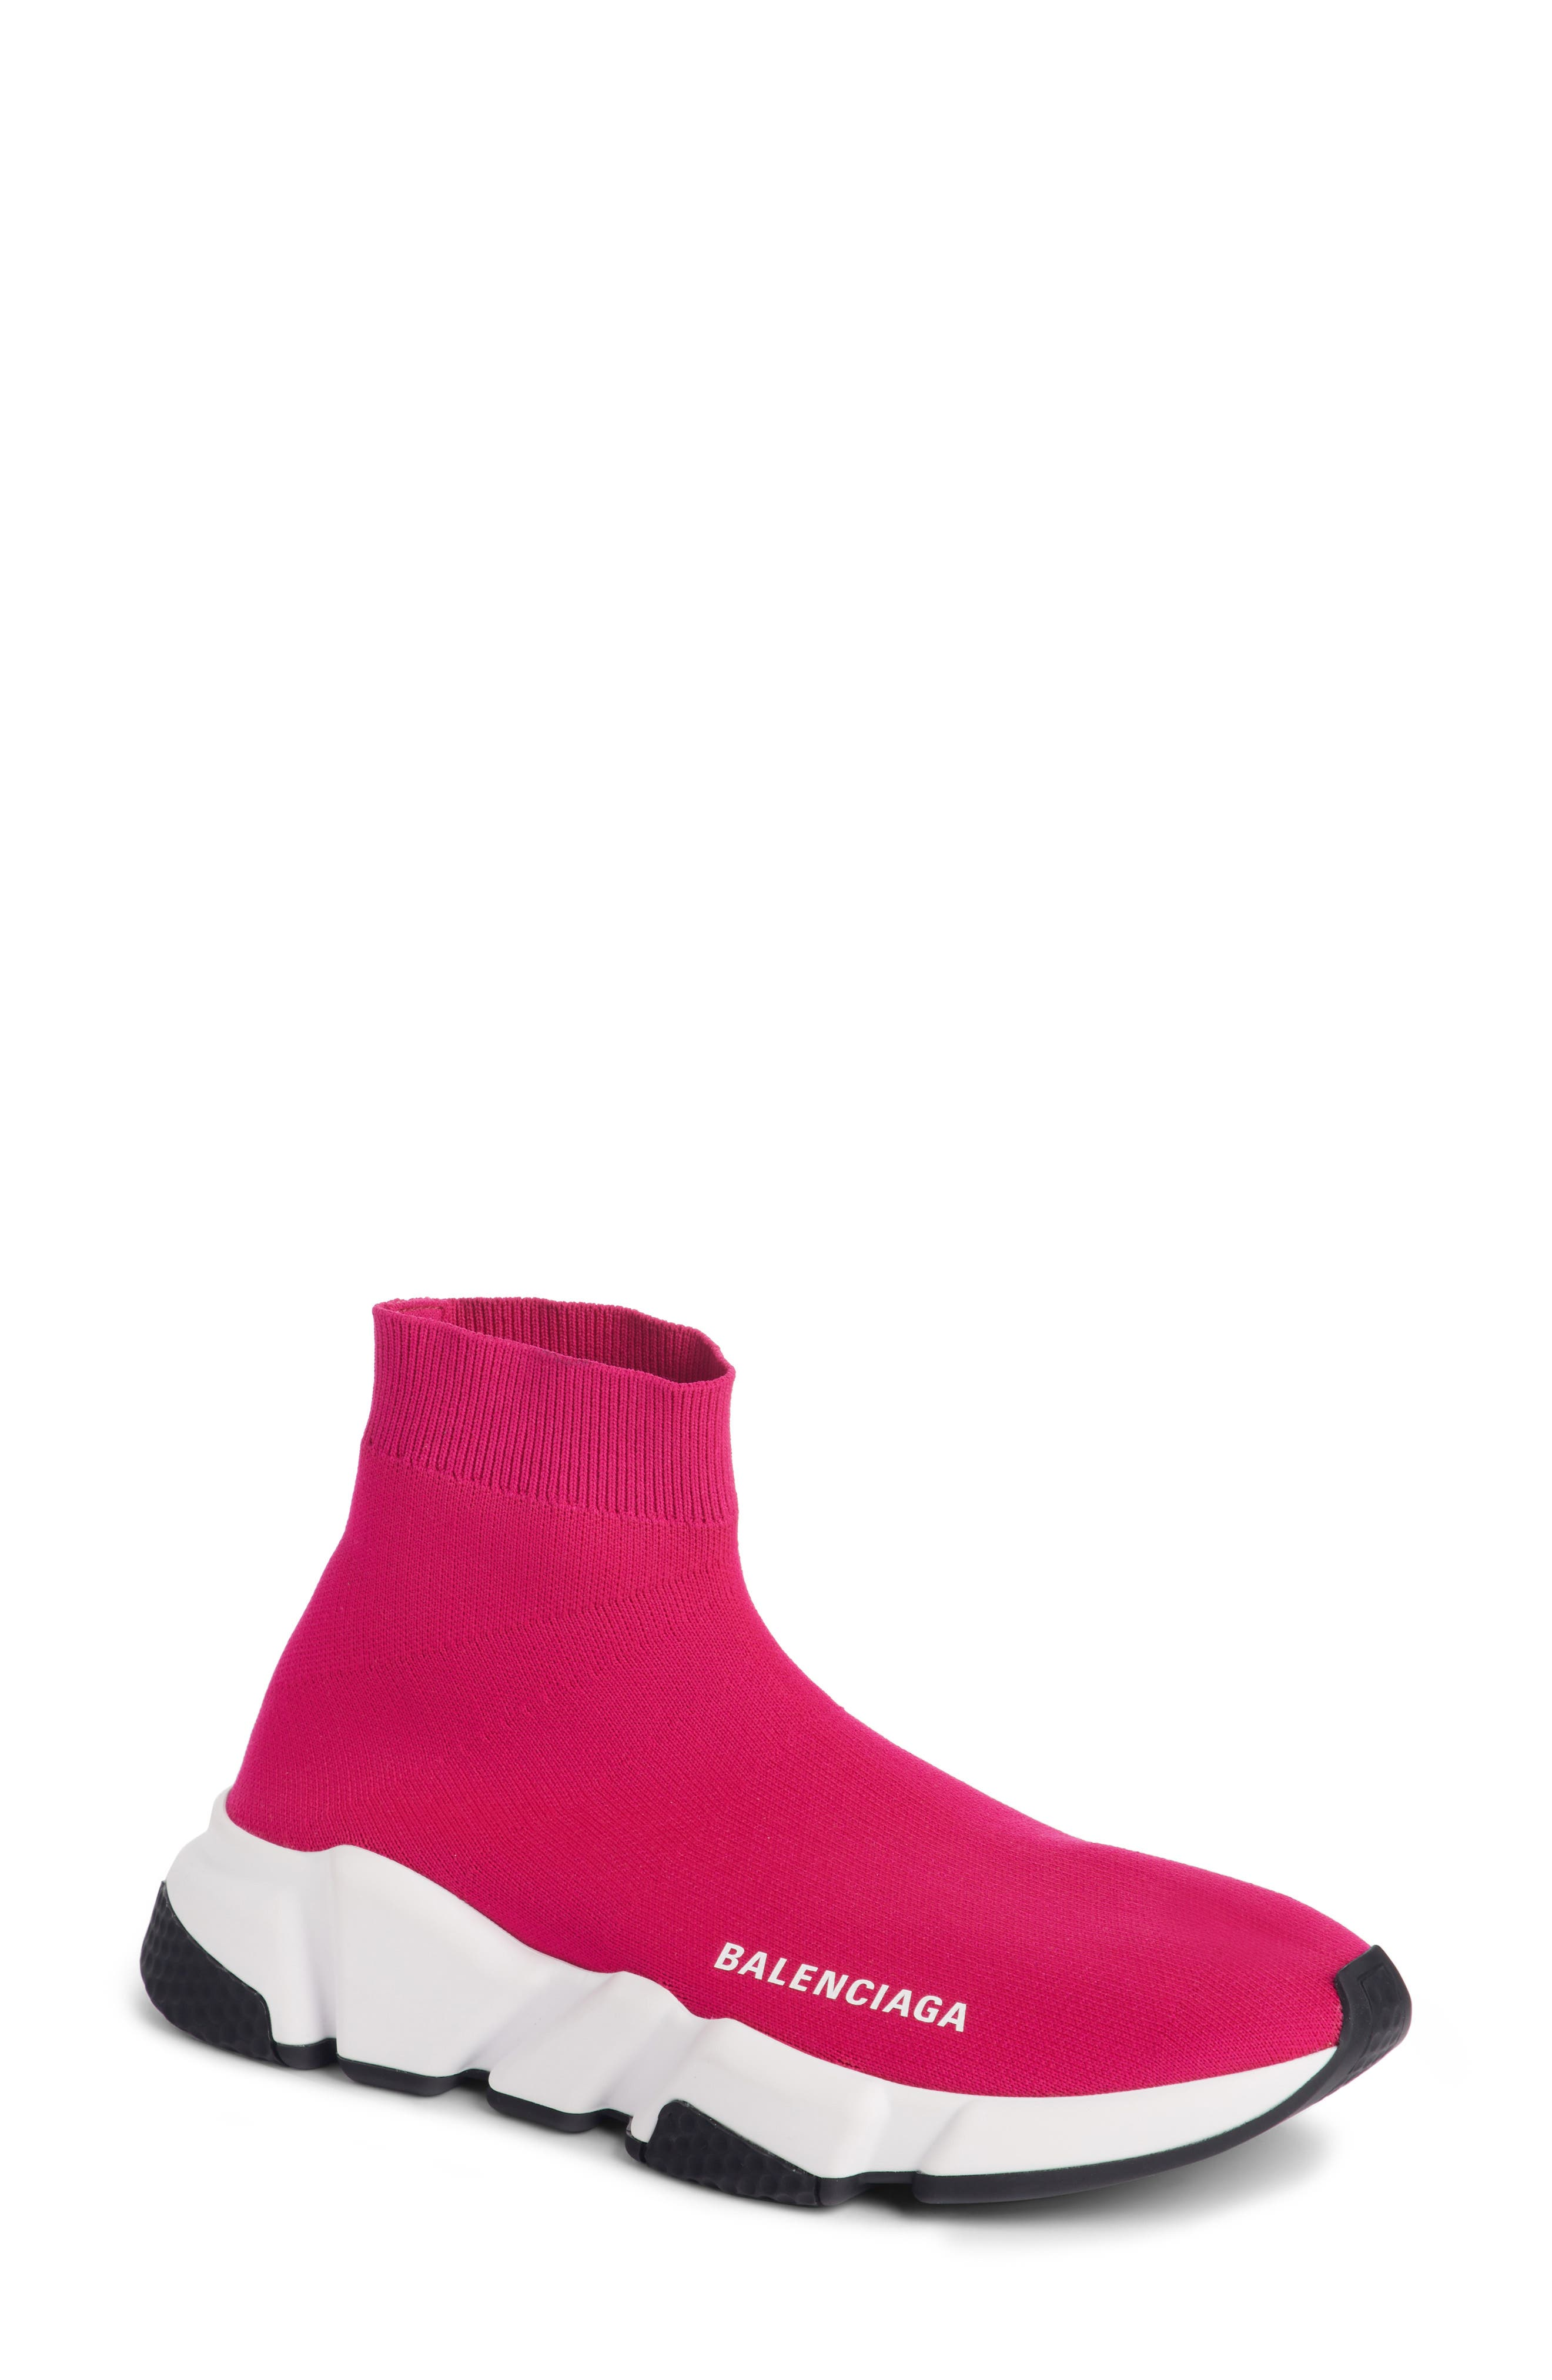 Speed Sock Stretch-Knit Sneakers in Fuschia Rose